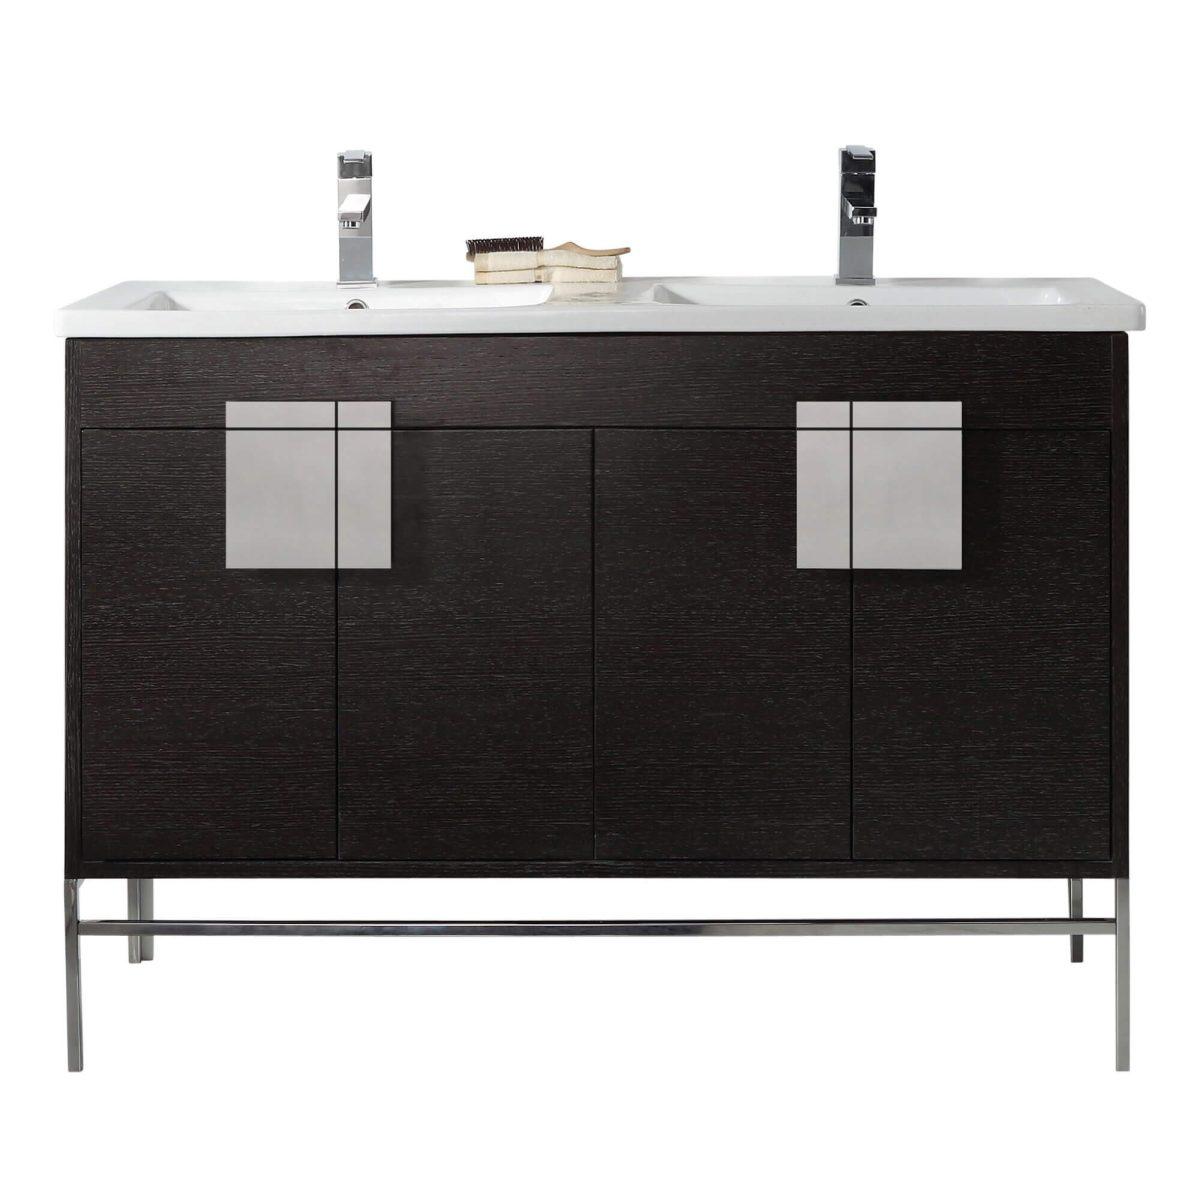 "Shawbridge 48"" Modern Double Bathroom Vanity  Black Oak Straight Grain with Polished Chrome Hardware"